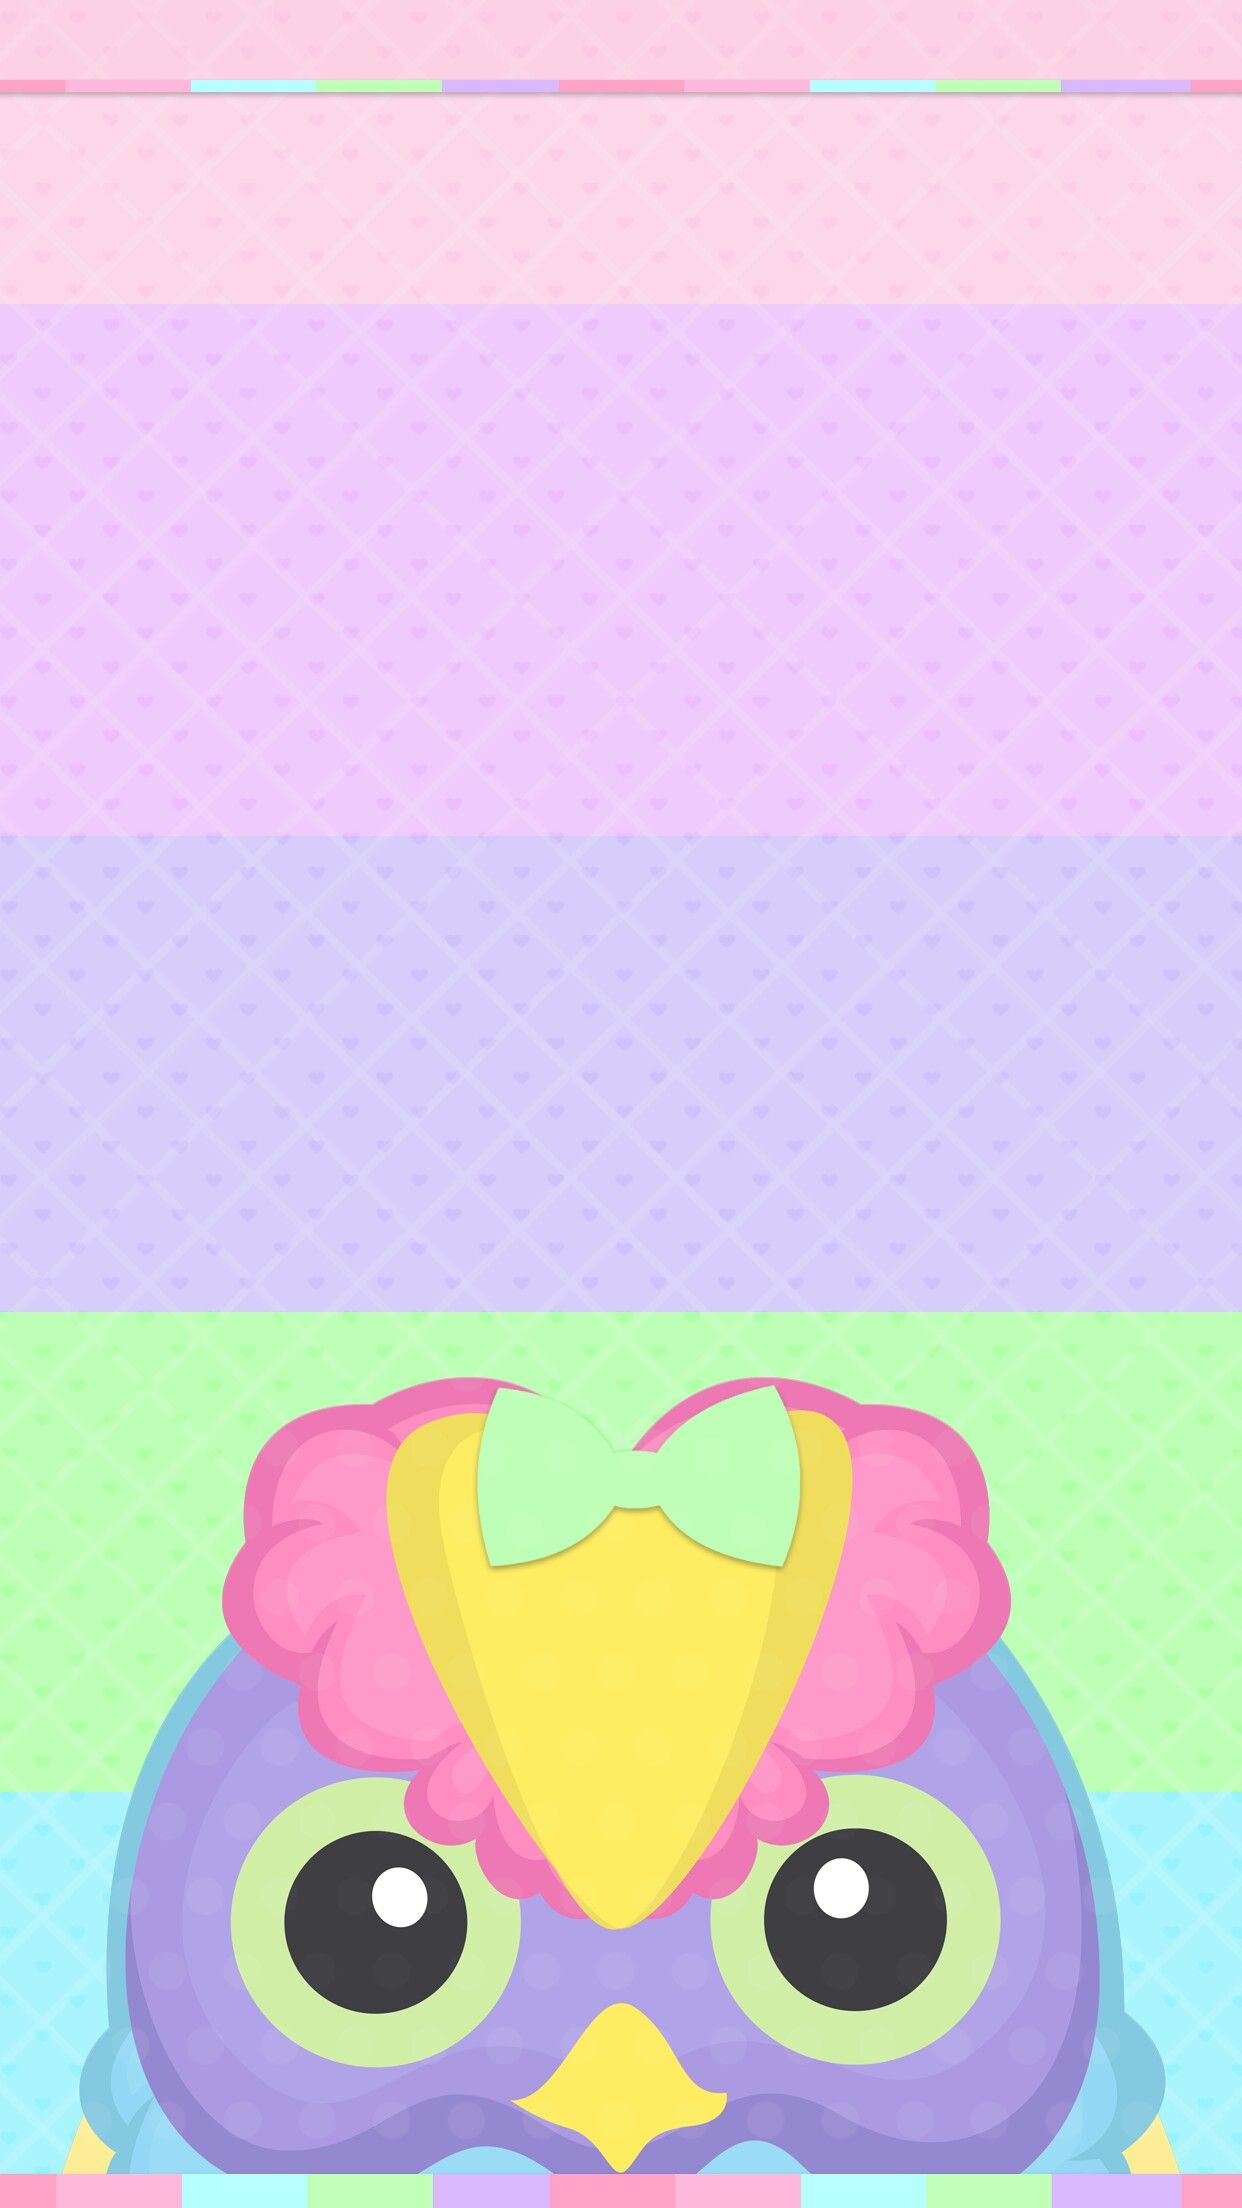 Simple Wallpaper Hello Kitty Purple - c7f8b24017a2205dc8a1c2ce9ab2f007  Trends_677552.jpg